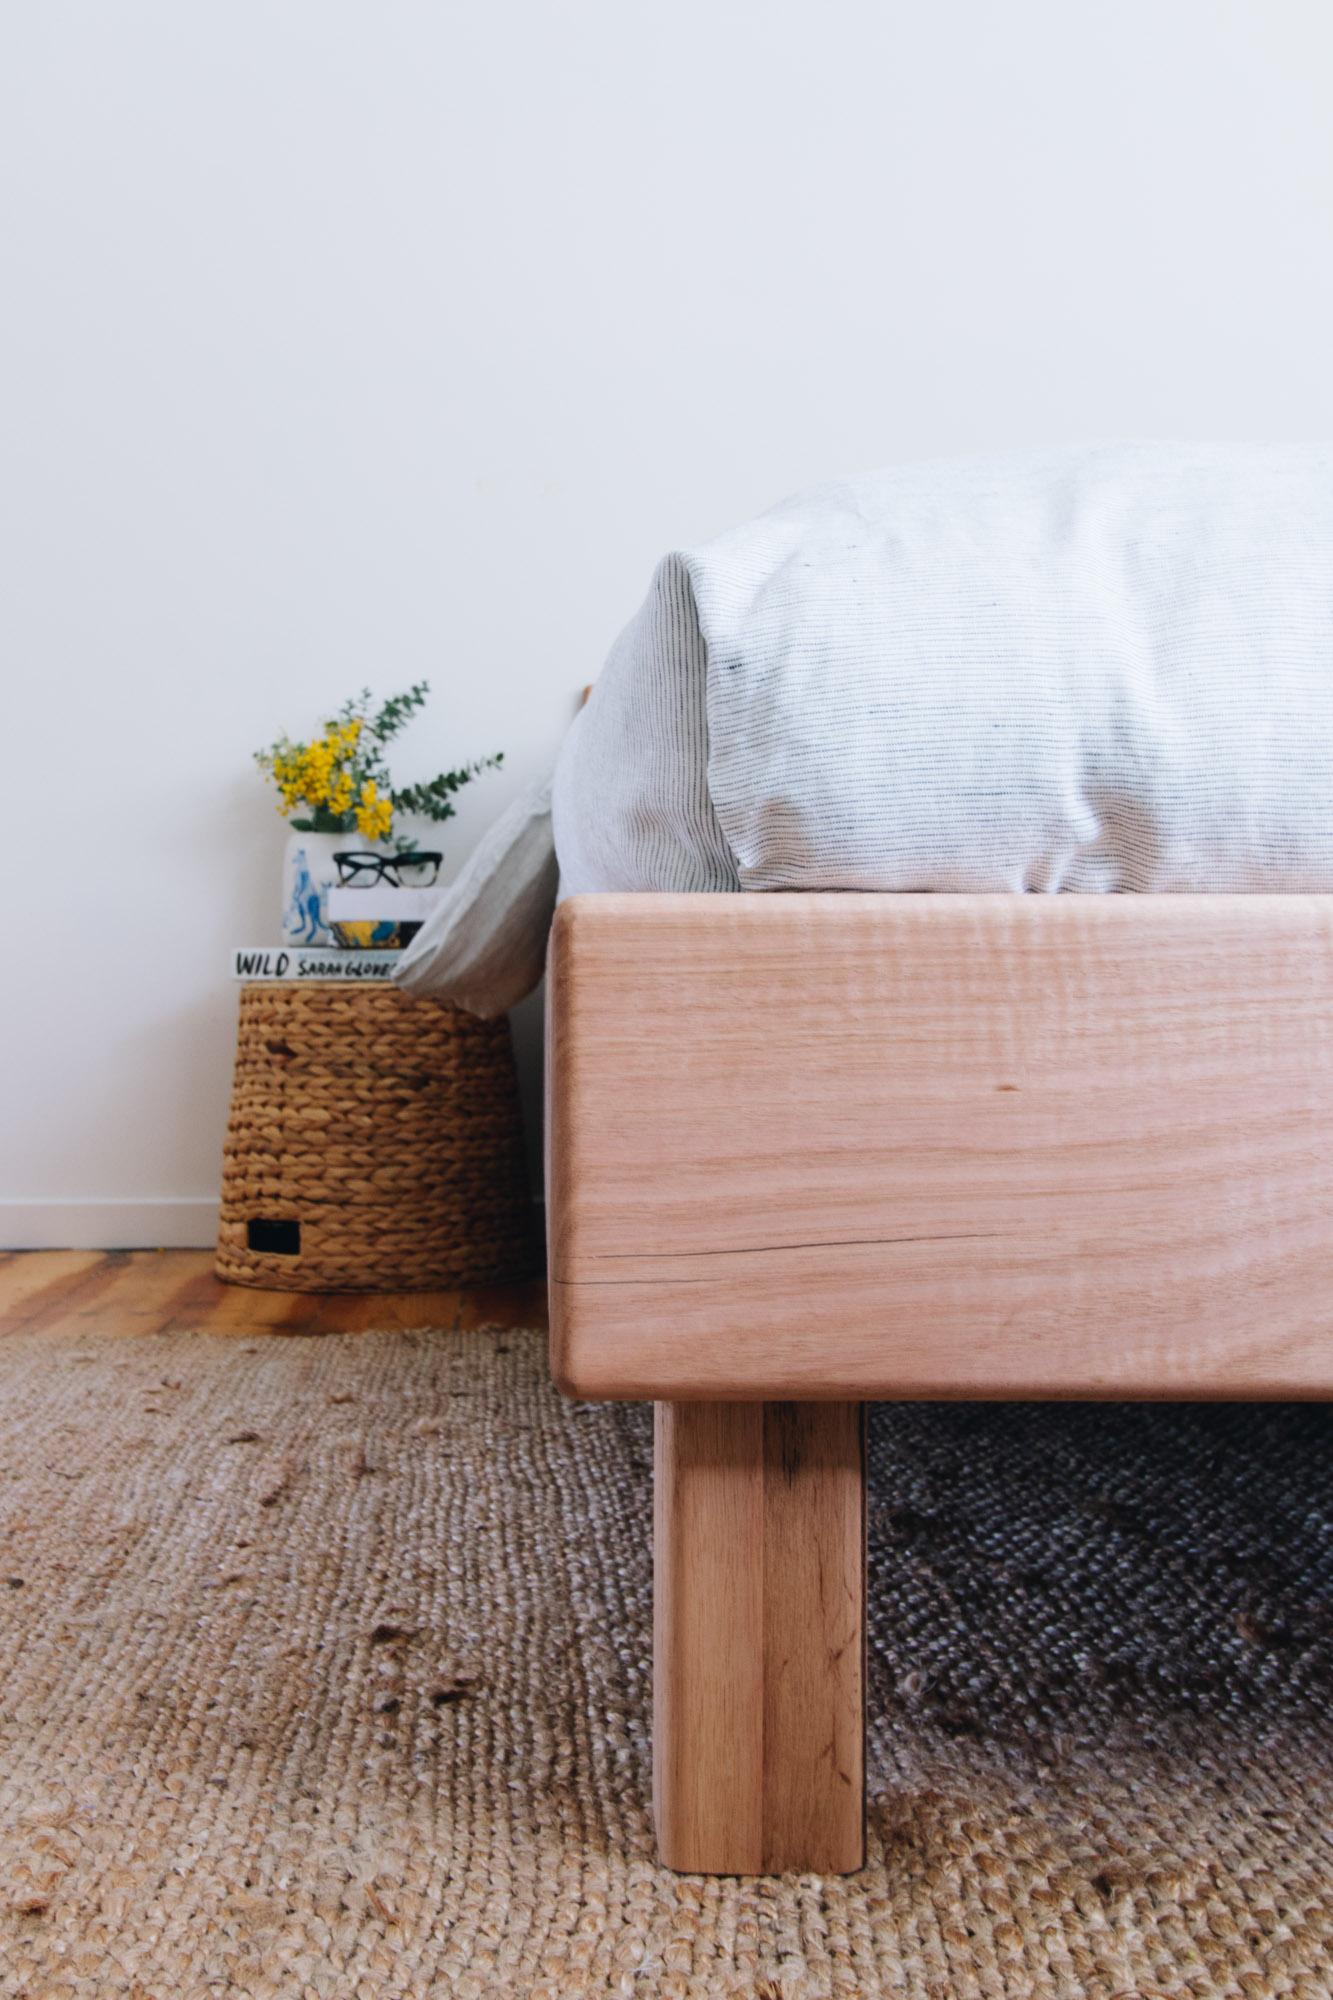 Al and Imo Handmade - Custom Minimalist bedframe - Low Bed with angled headboard - victorian ash - Melbourne - Australia_-10.jpg